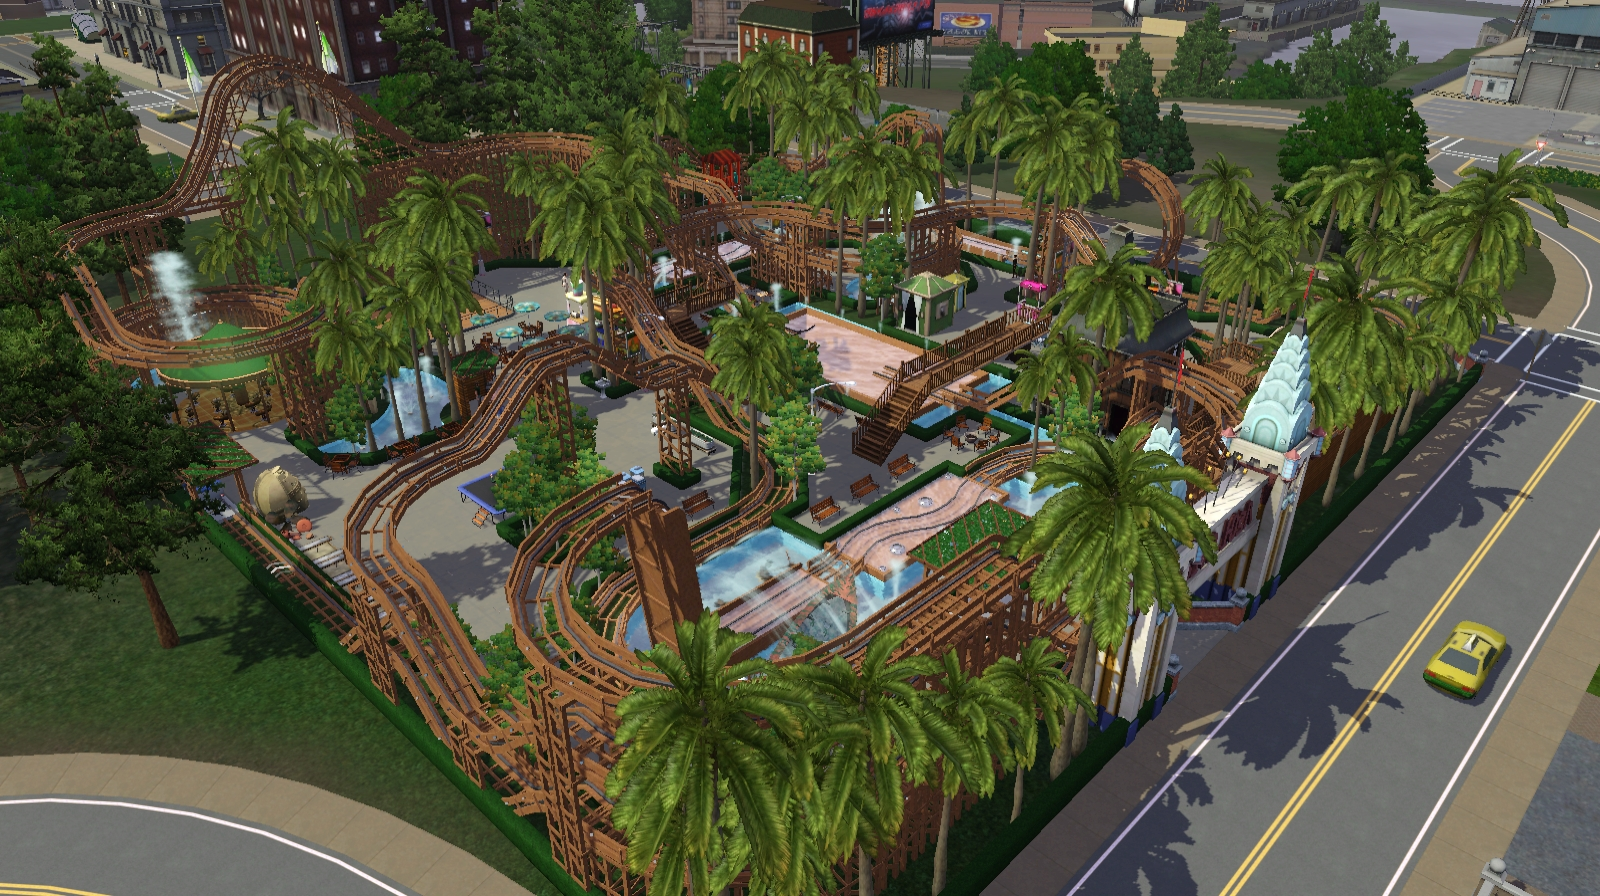 [Descarga] Parque Adventure Park. Screenshot-47